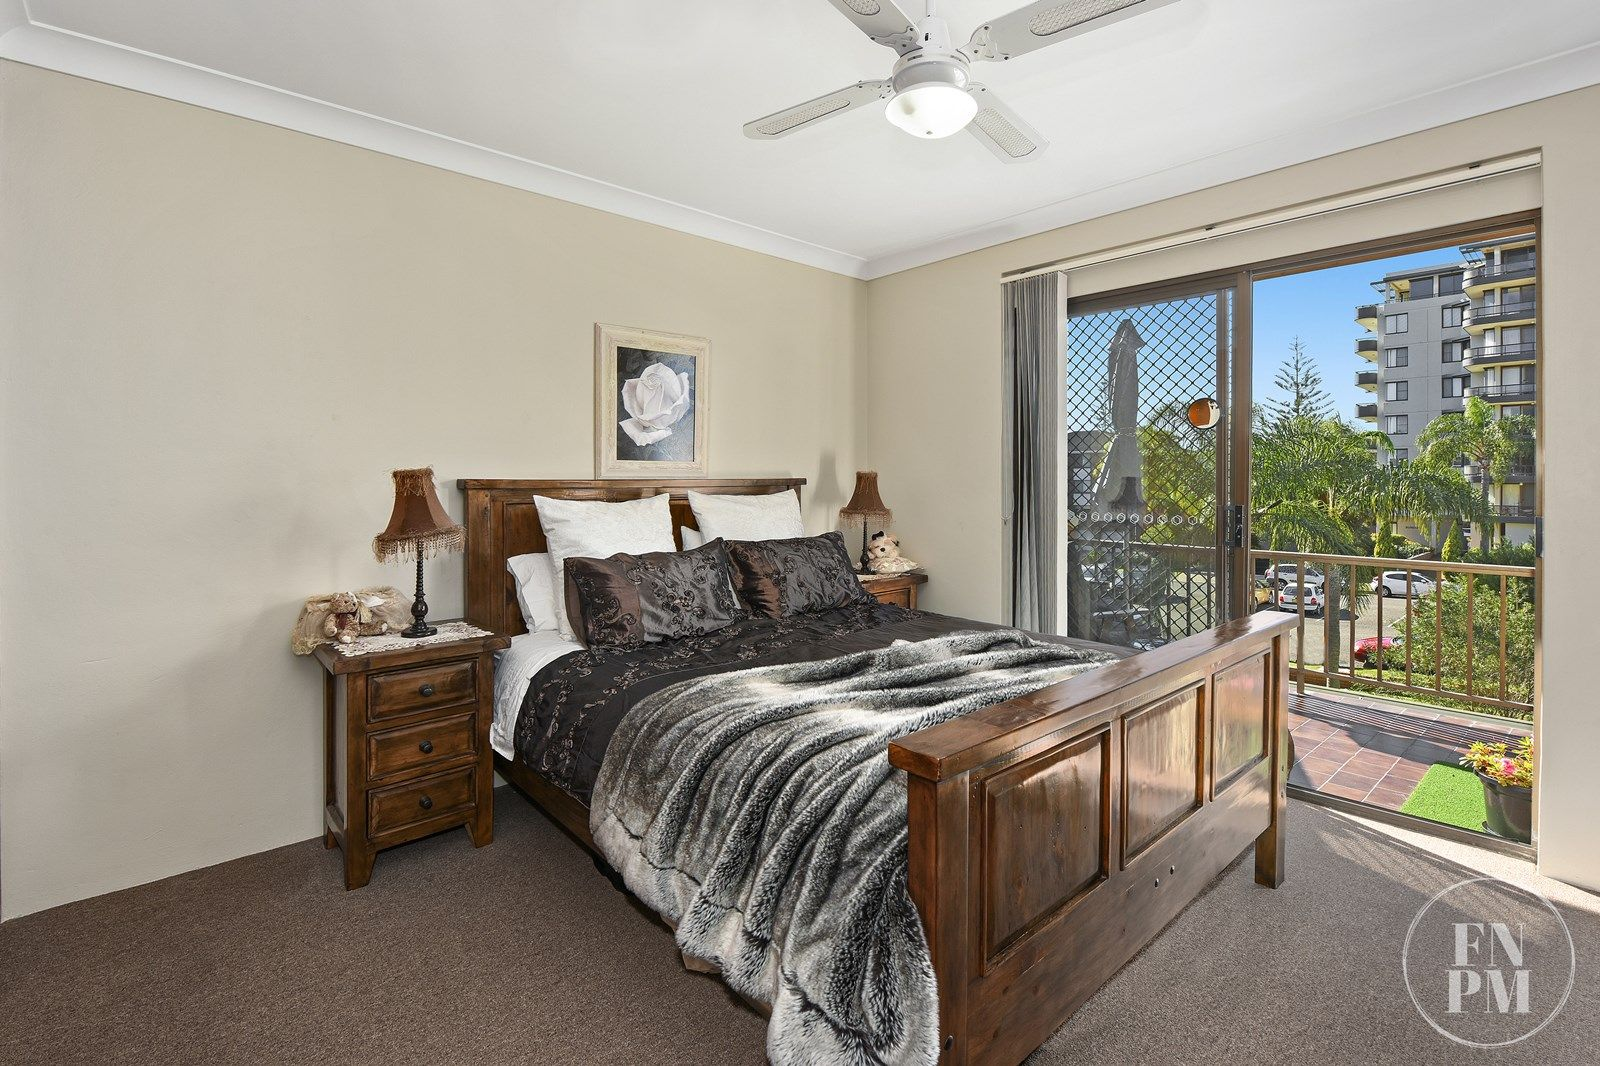 16/11-15 Hollingworth Street, Port Macquarie NSW 2444, Image 2